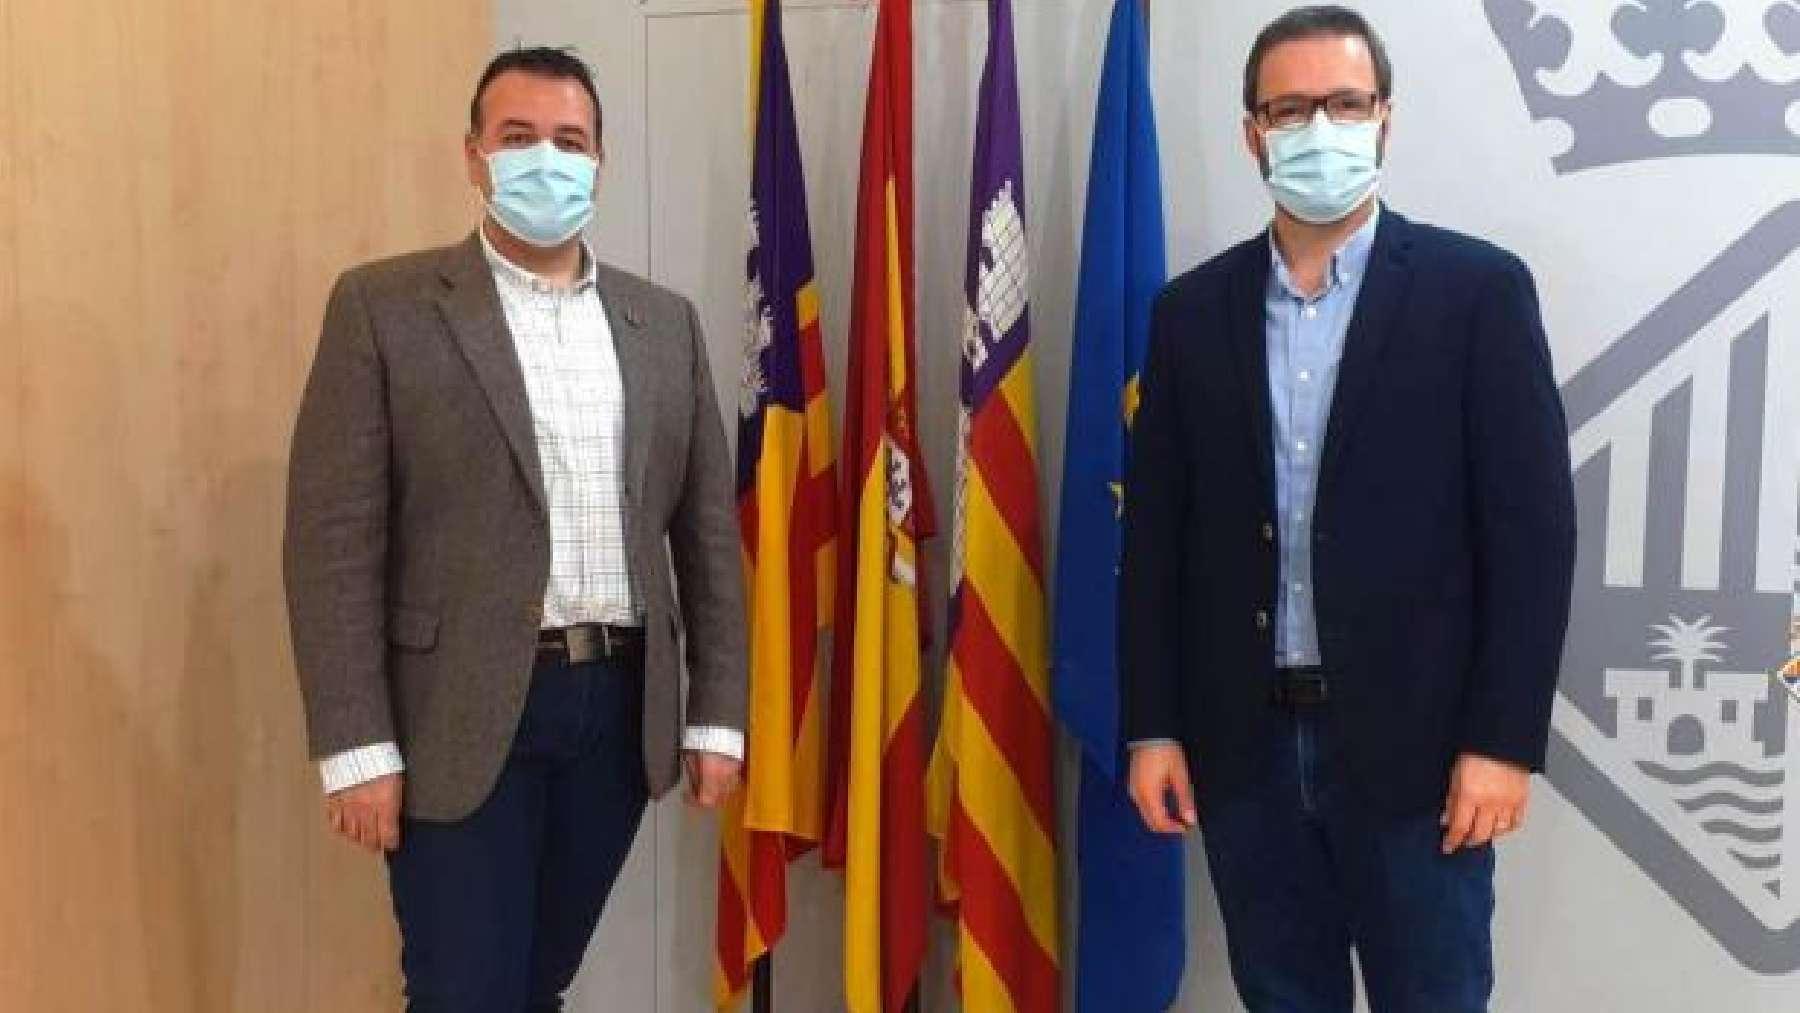 El concejal socialista de Movilidad, Francesc Dalmau y el alcalde de Palma, Jose Hila.